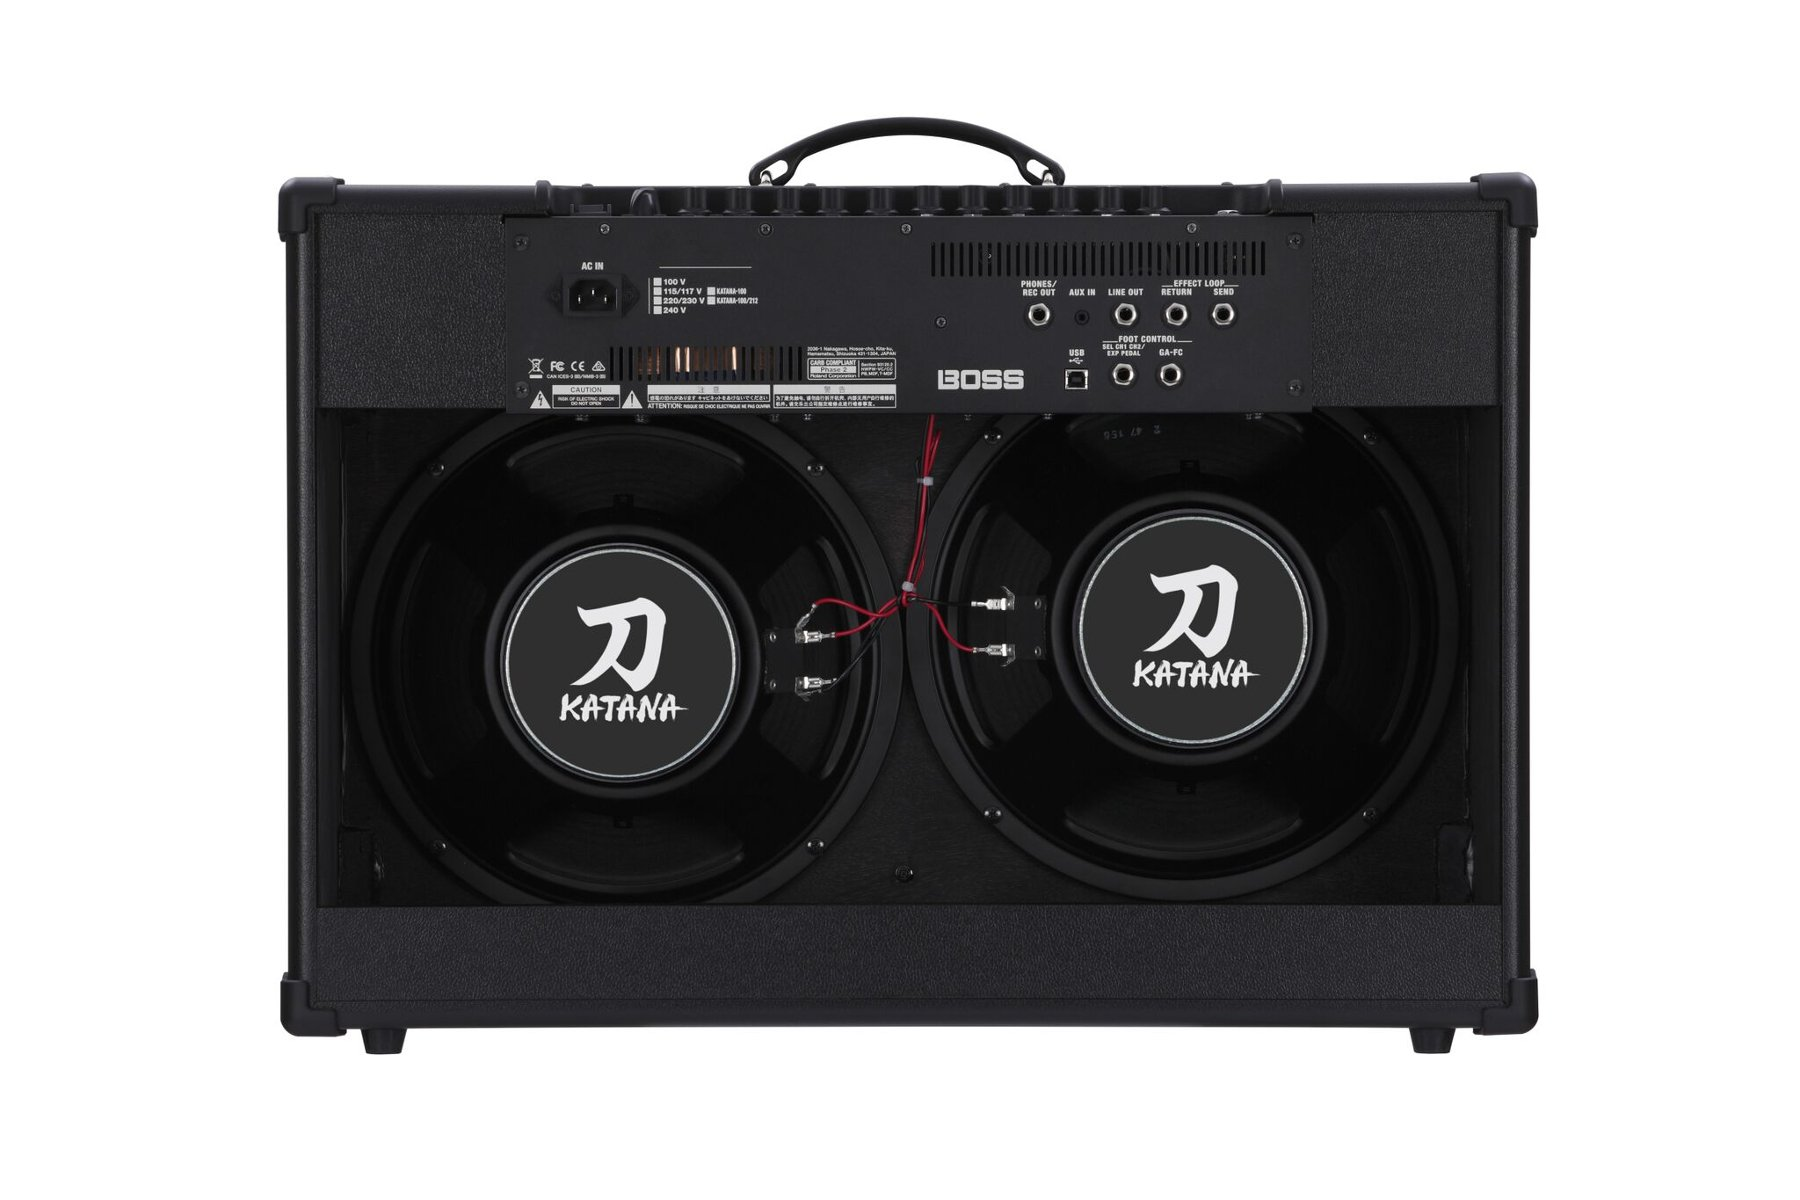 2x12 Combo Guitar Amplifier, 100W